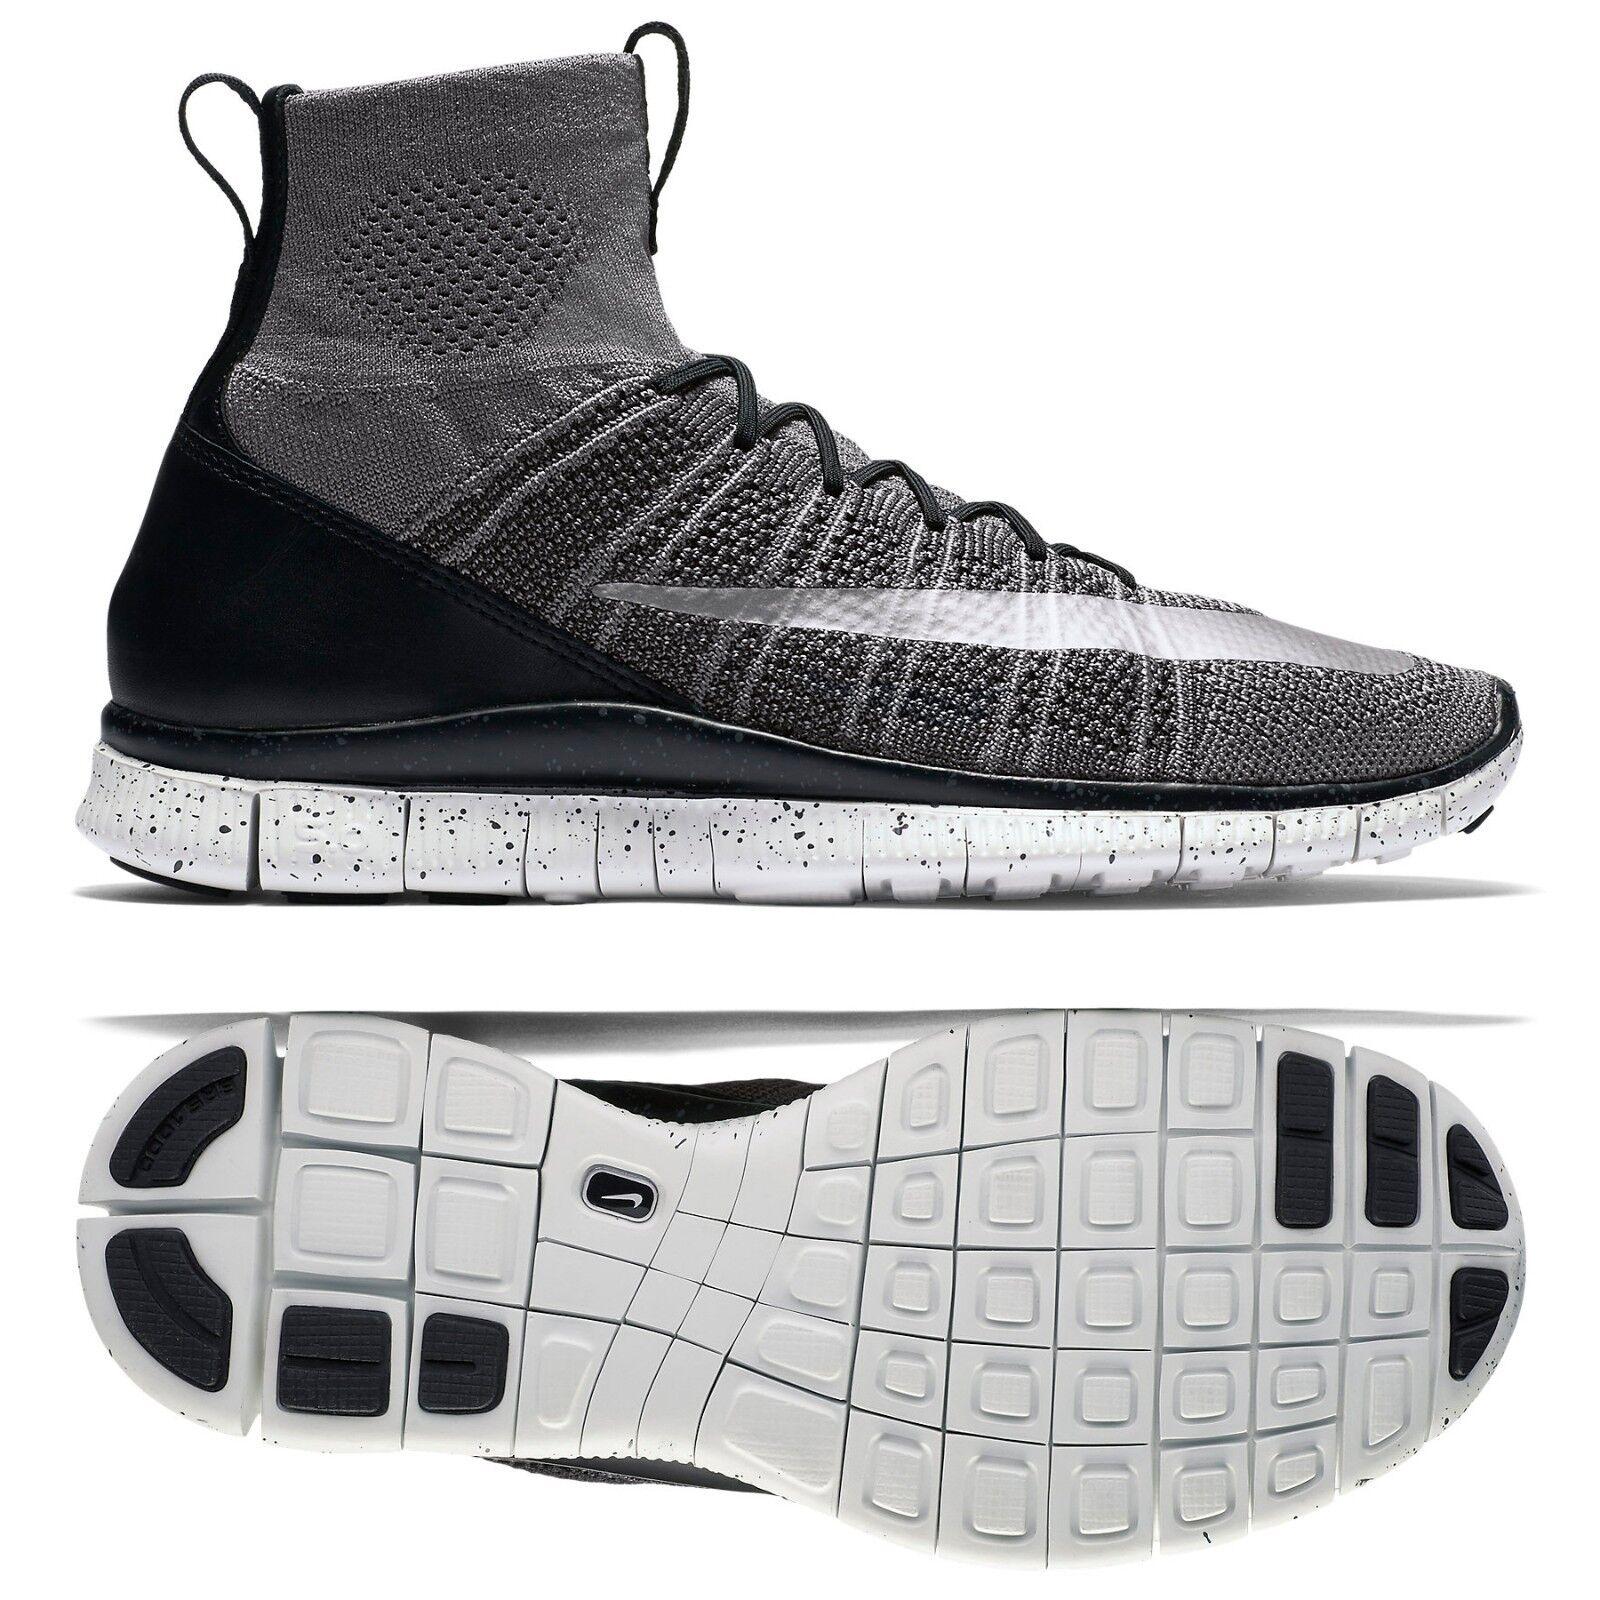 Nike Free Flyknit Mercurial CR7 805554-004 Grey/Black/White/Silver Men's Shoes